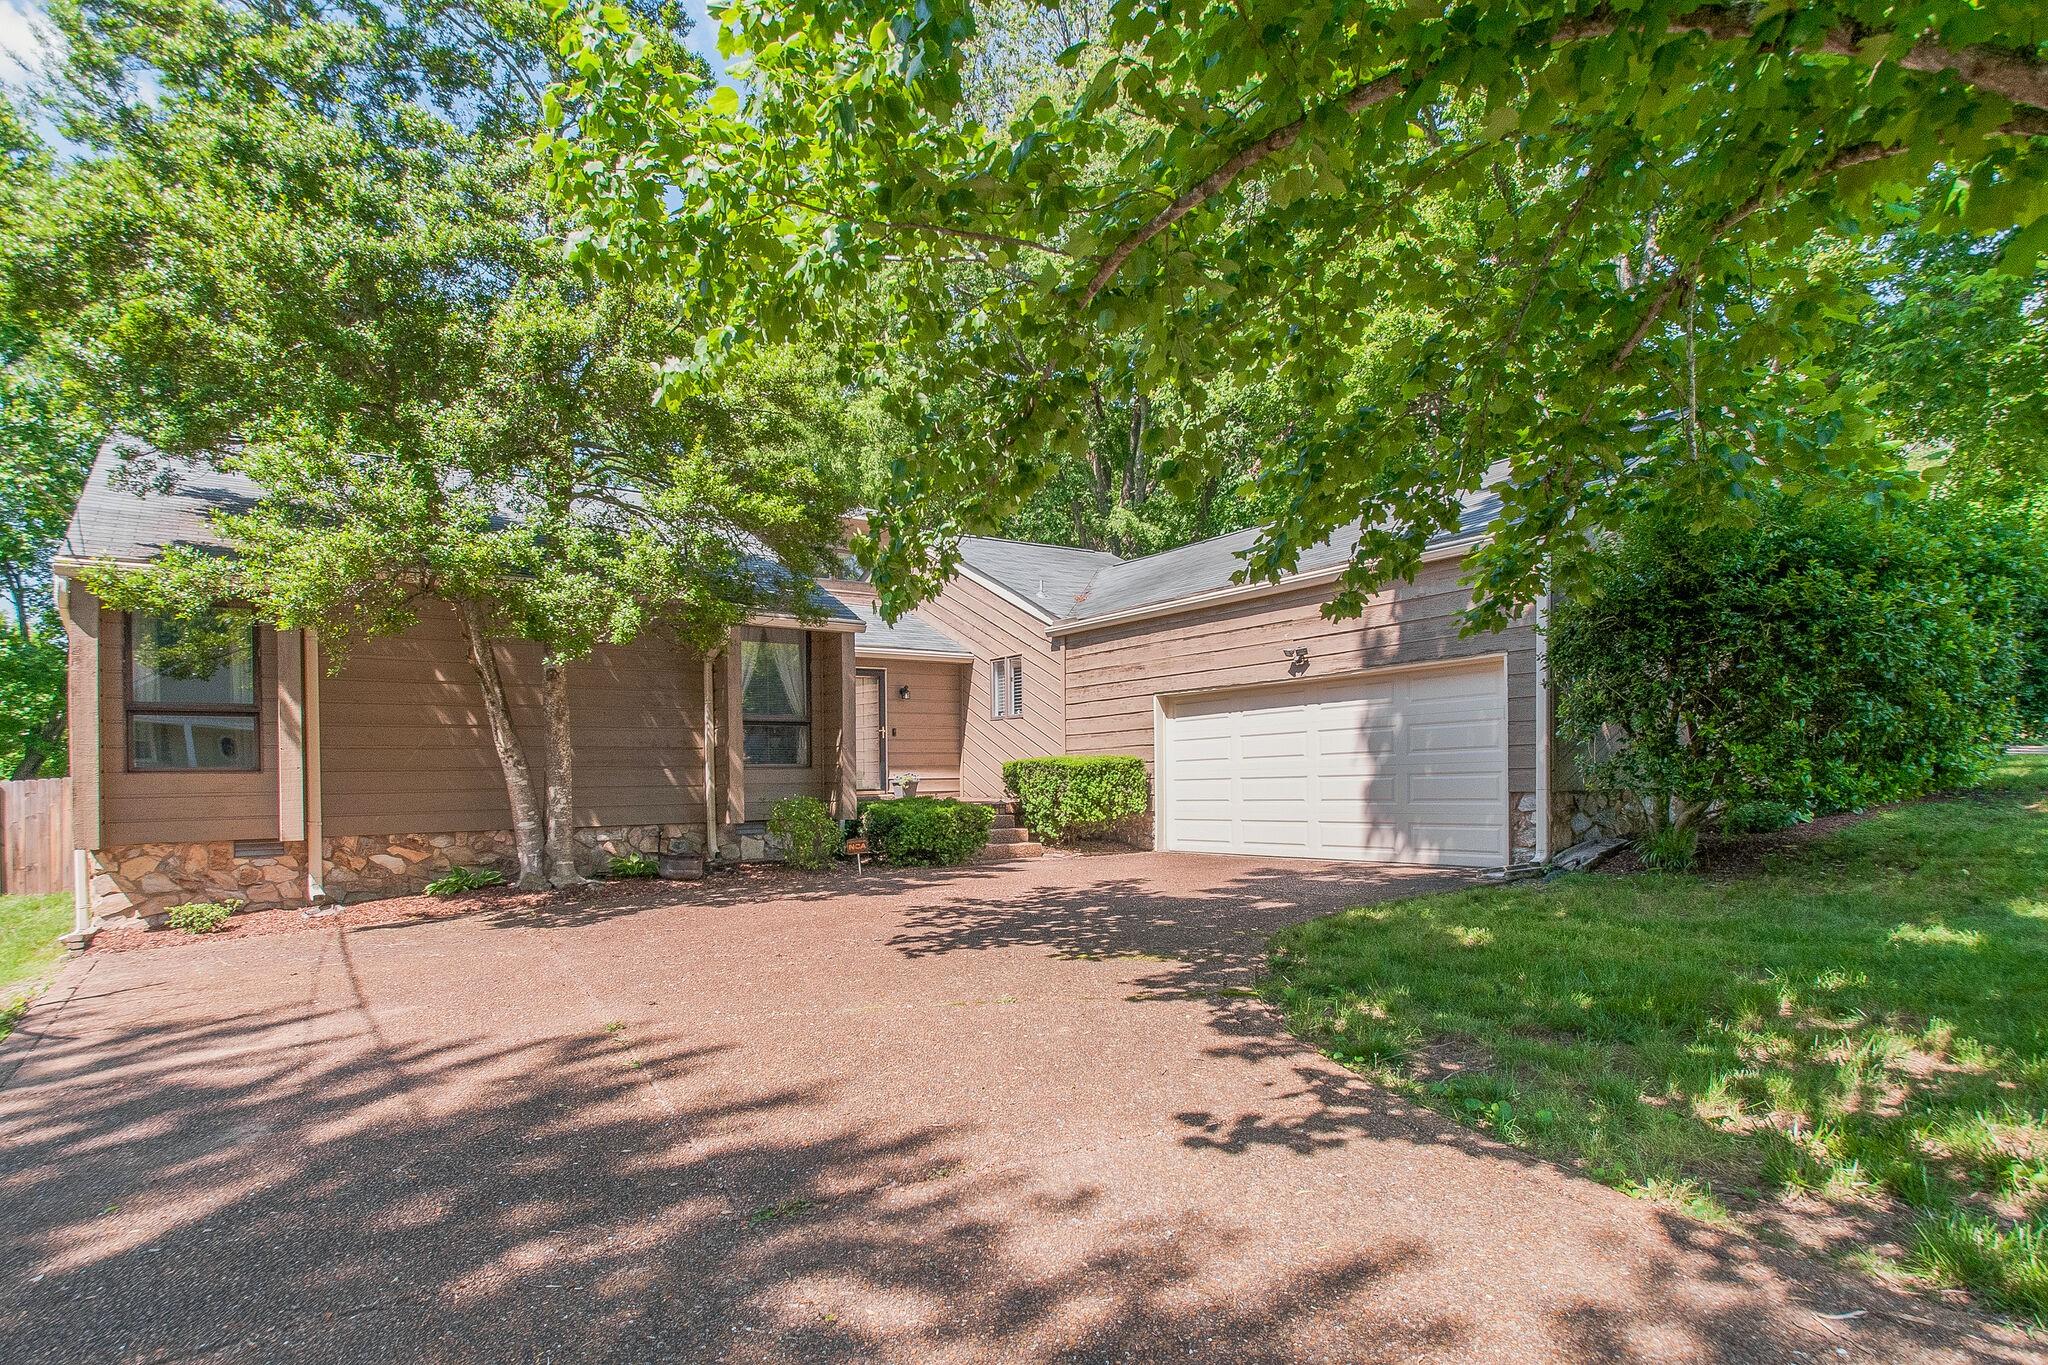 7029 Bay Cove Trail Property Photo - Nashville, TN real estate listing